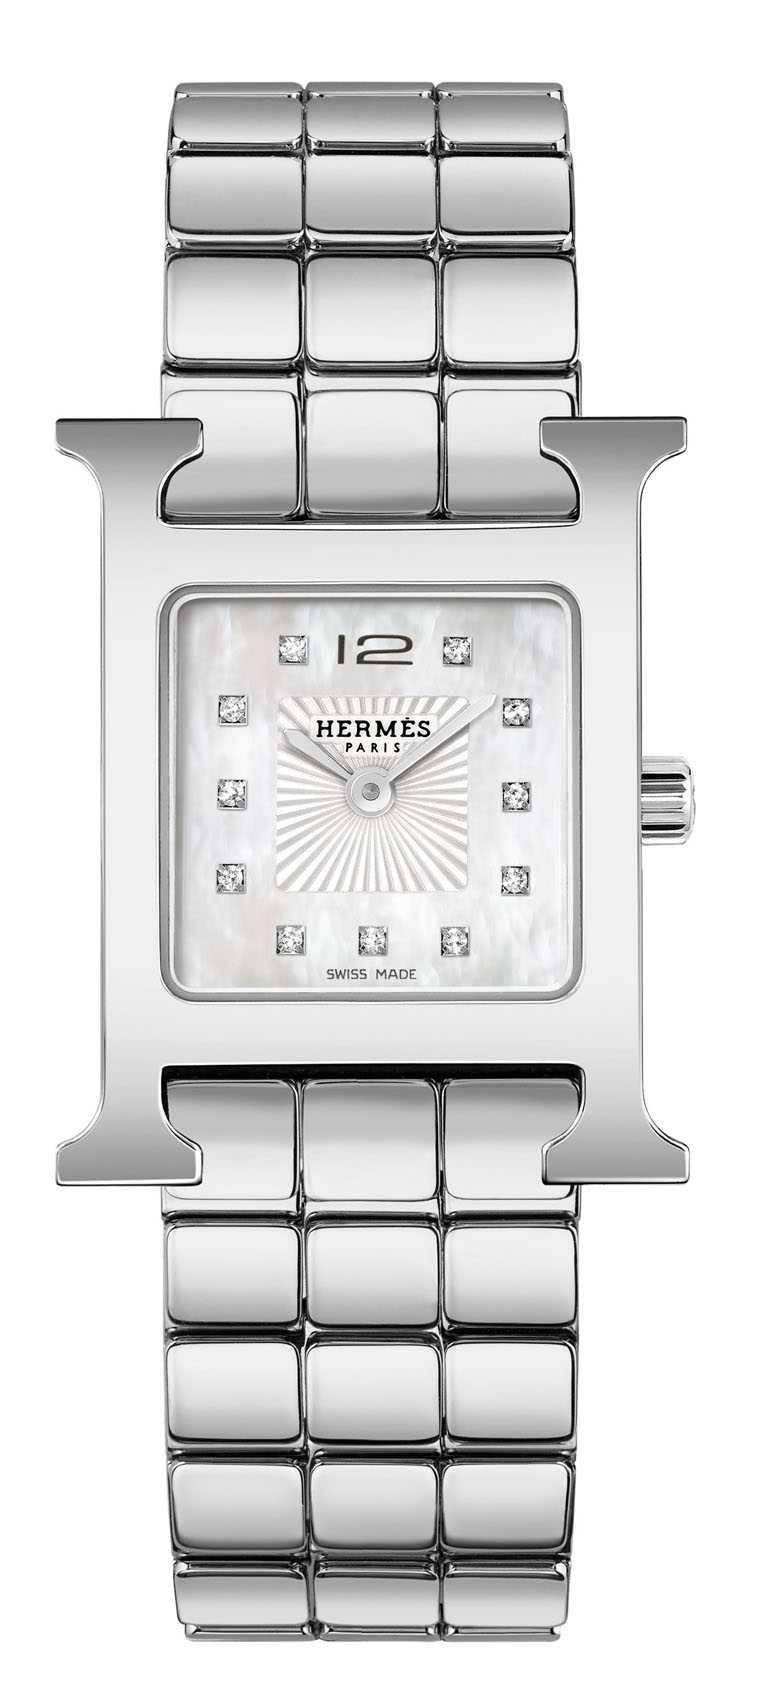 HERMÈS「HEURE H」精鋼鍊帶腕錶,316L精鋼錶殼,21mm,鑽石11顆╱136,900元。(圖╱HERMÈS提供)